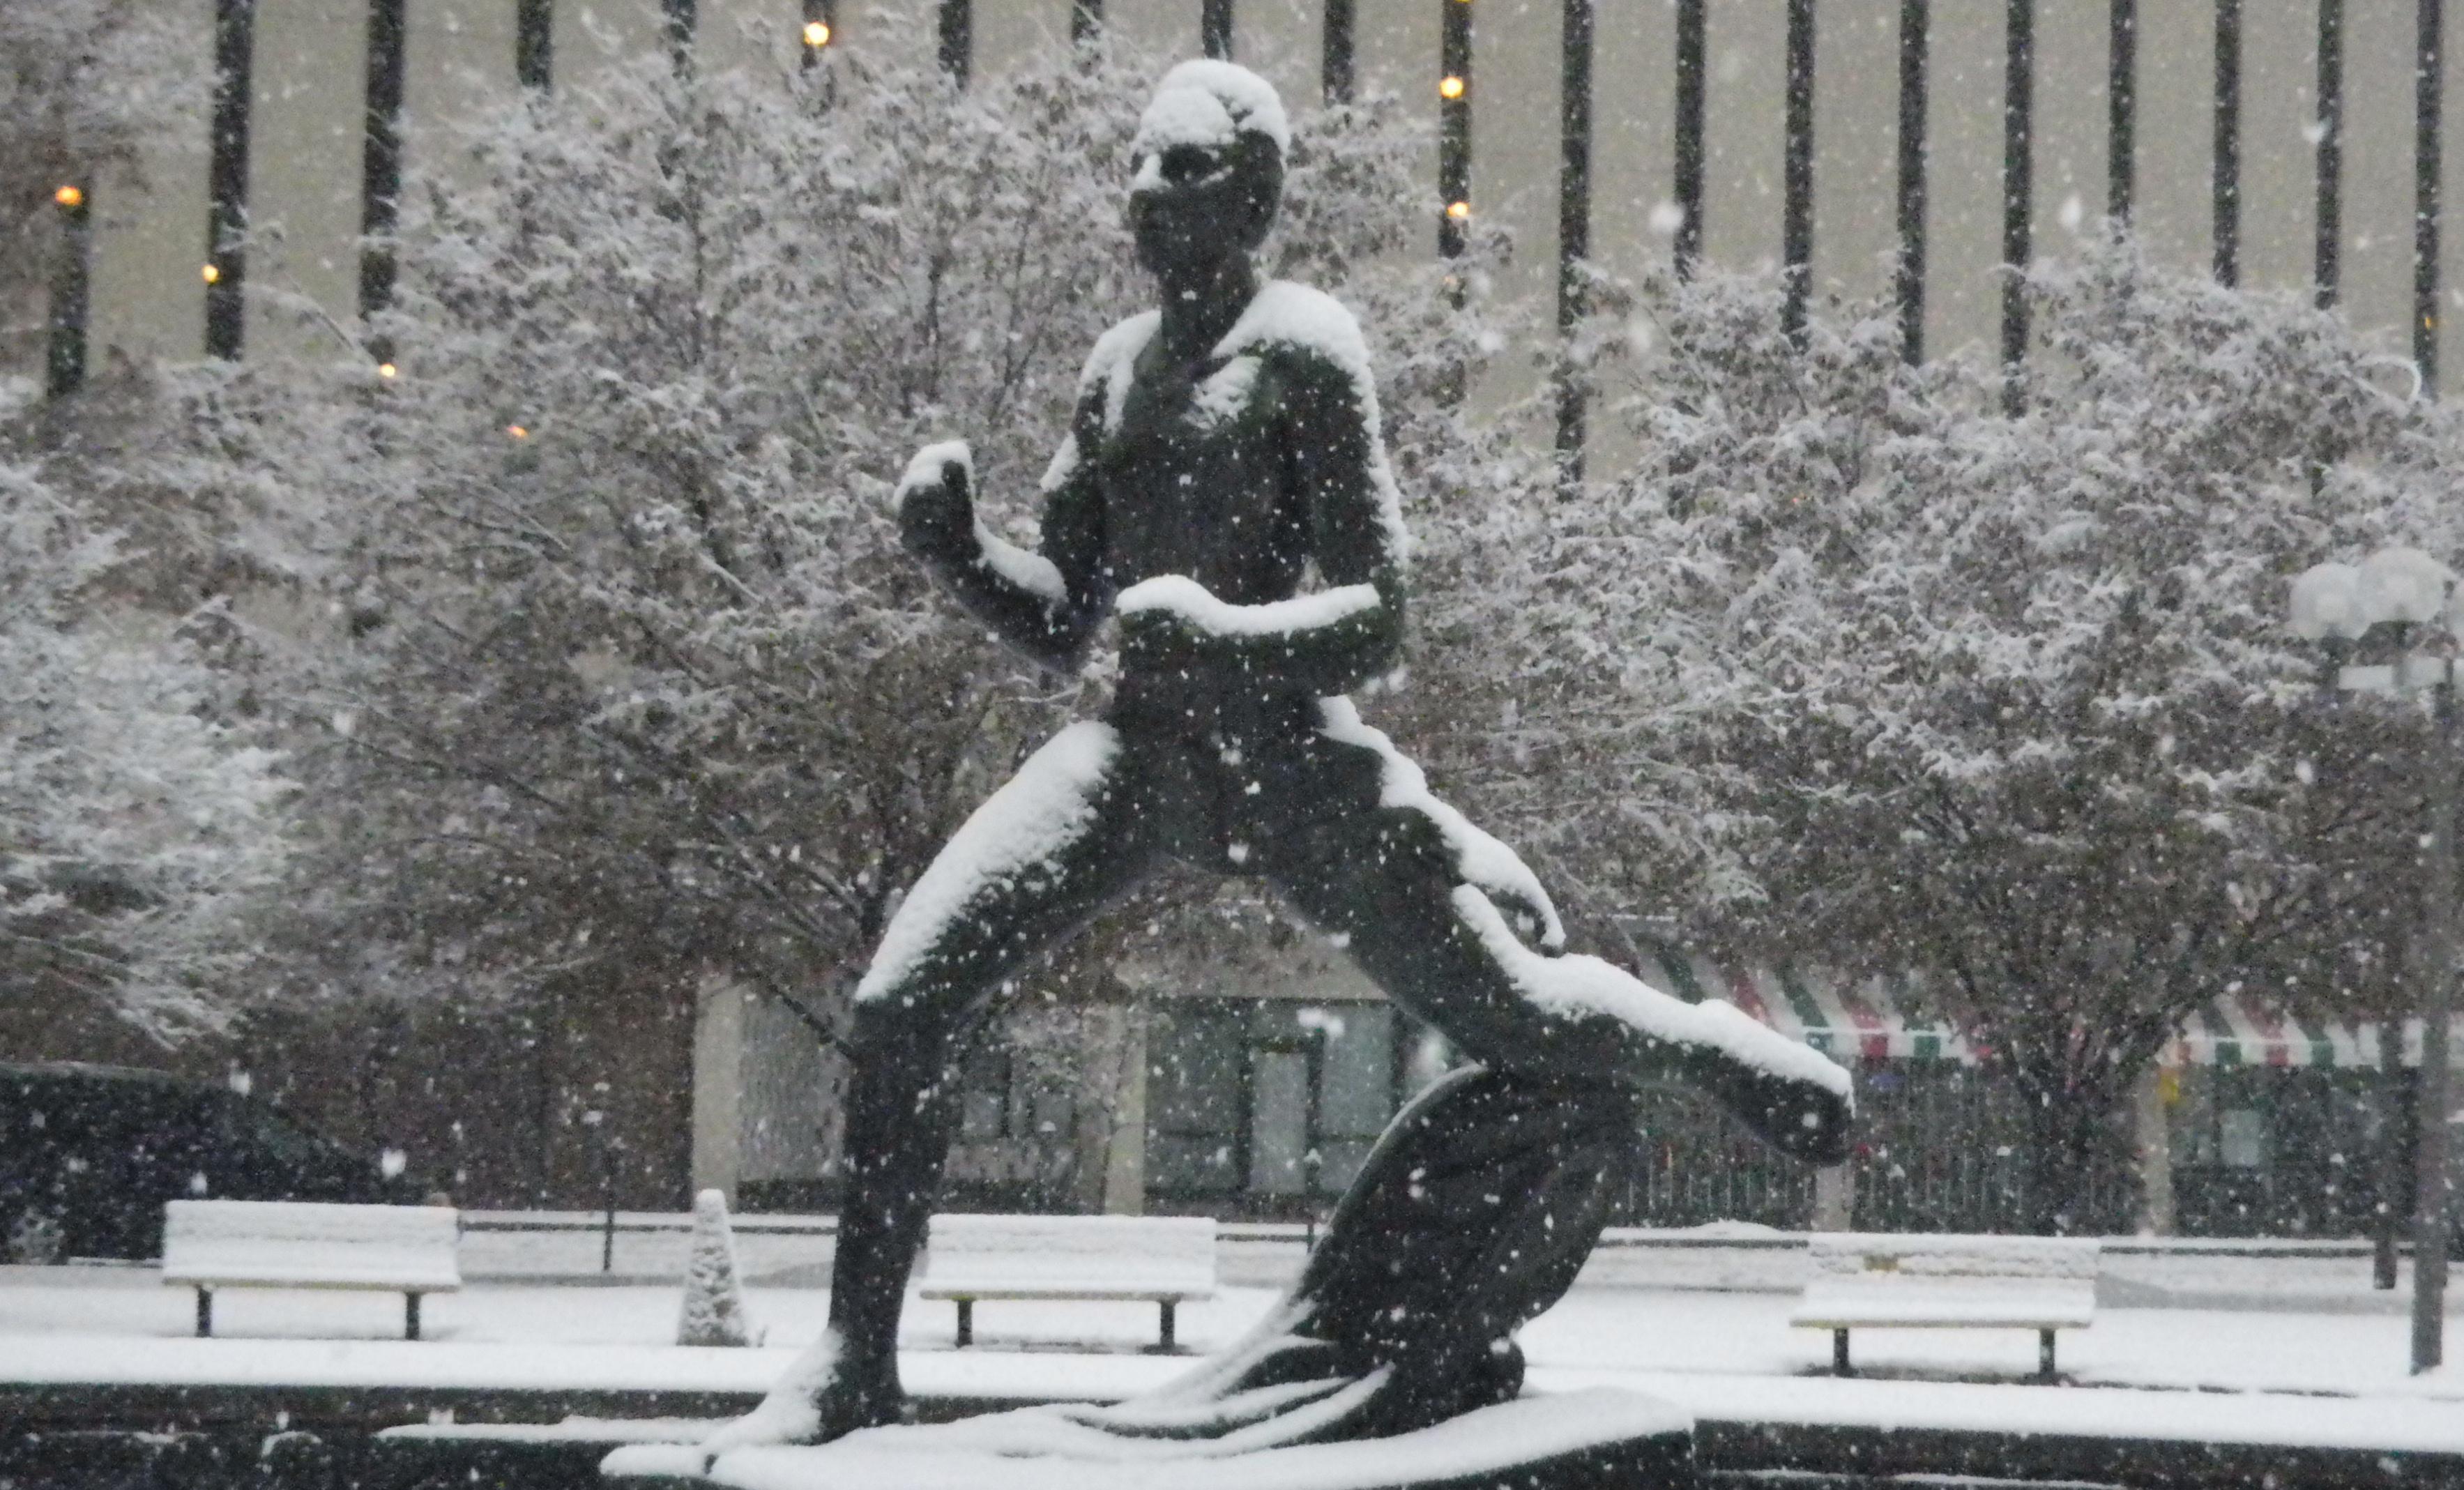 The Runner in Snow